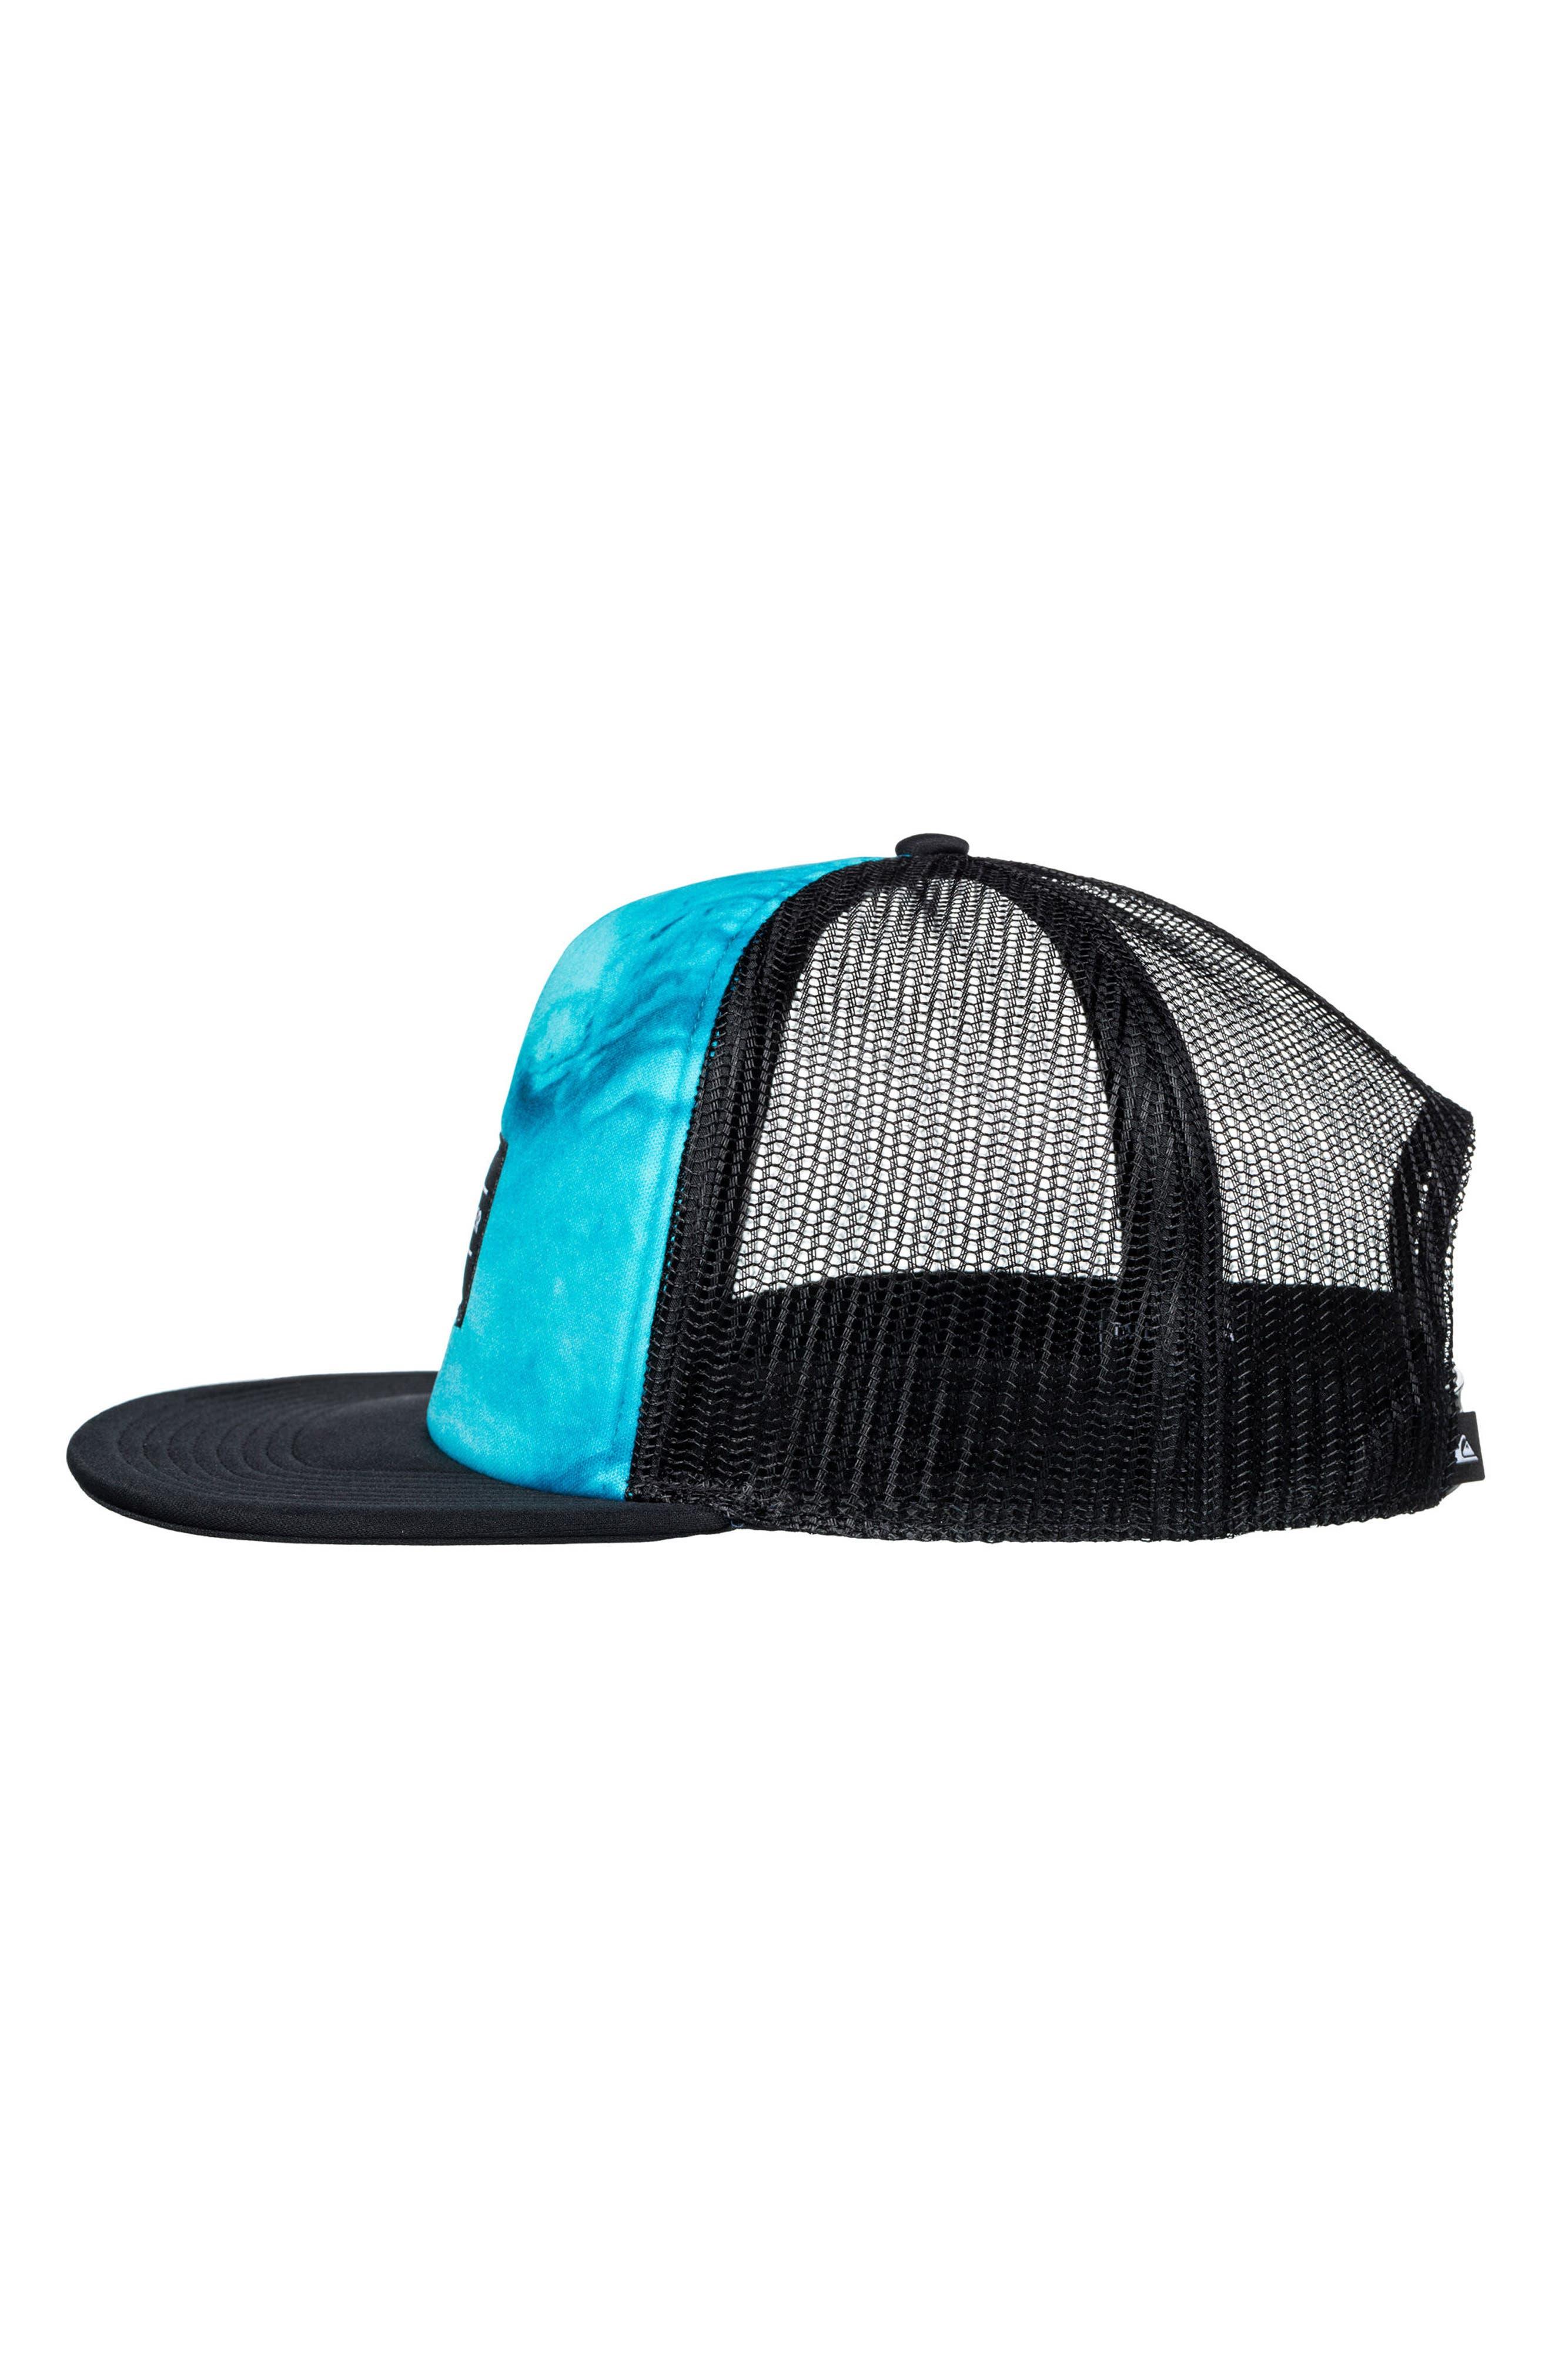 Brissells Snapback Trucker Hat,                             Alternate thumbnail 2, color,                             002